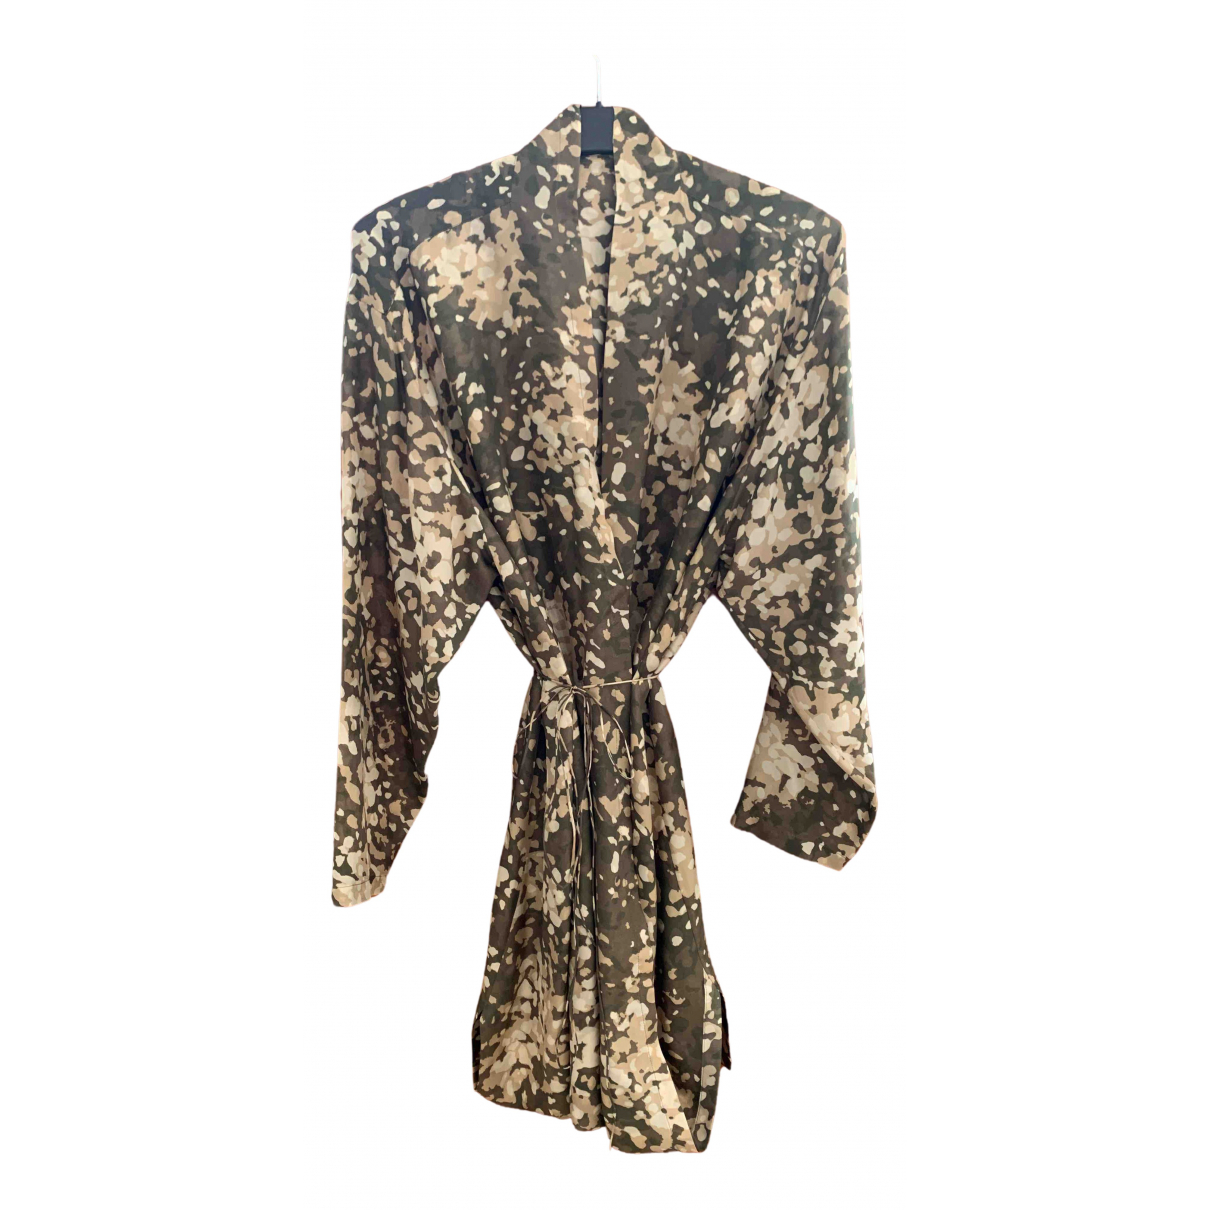 Stella Mccartney N Khaki Silk dress for Women 42 IT